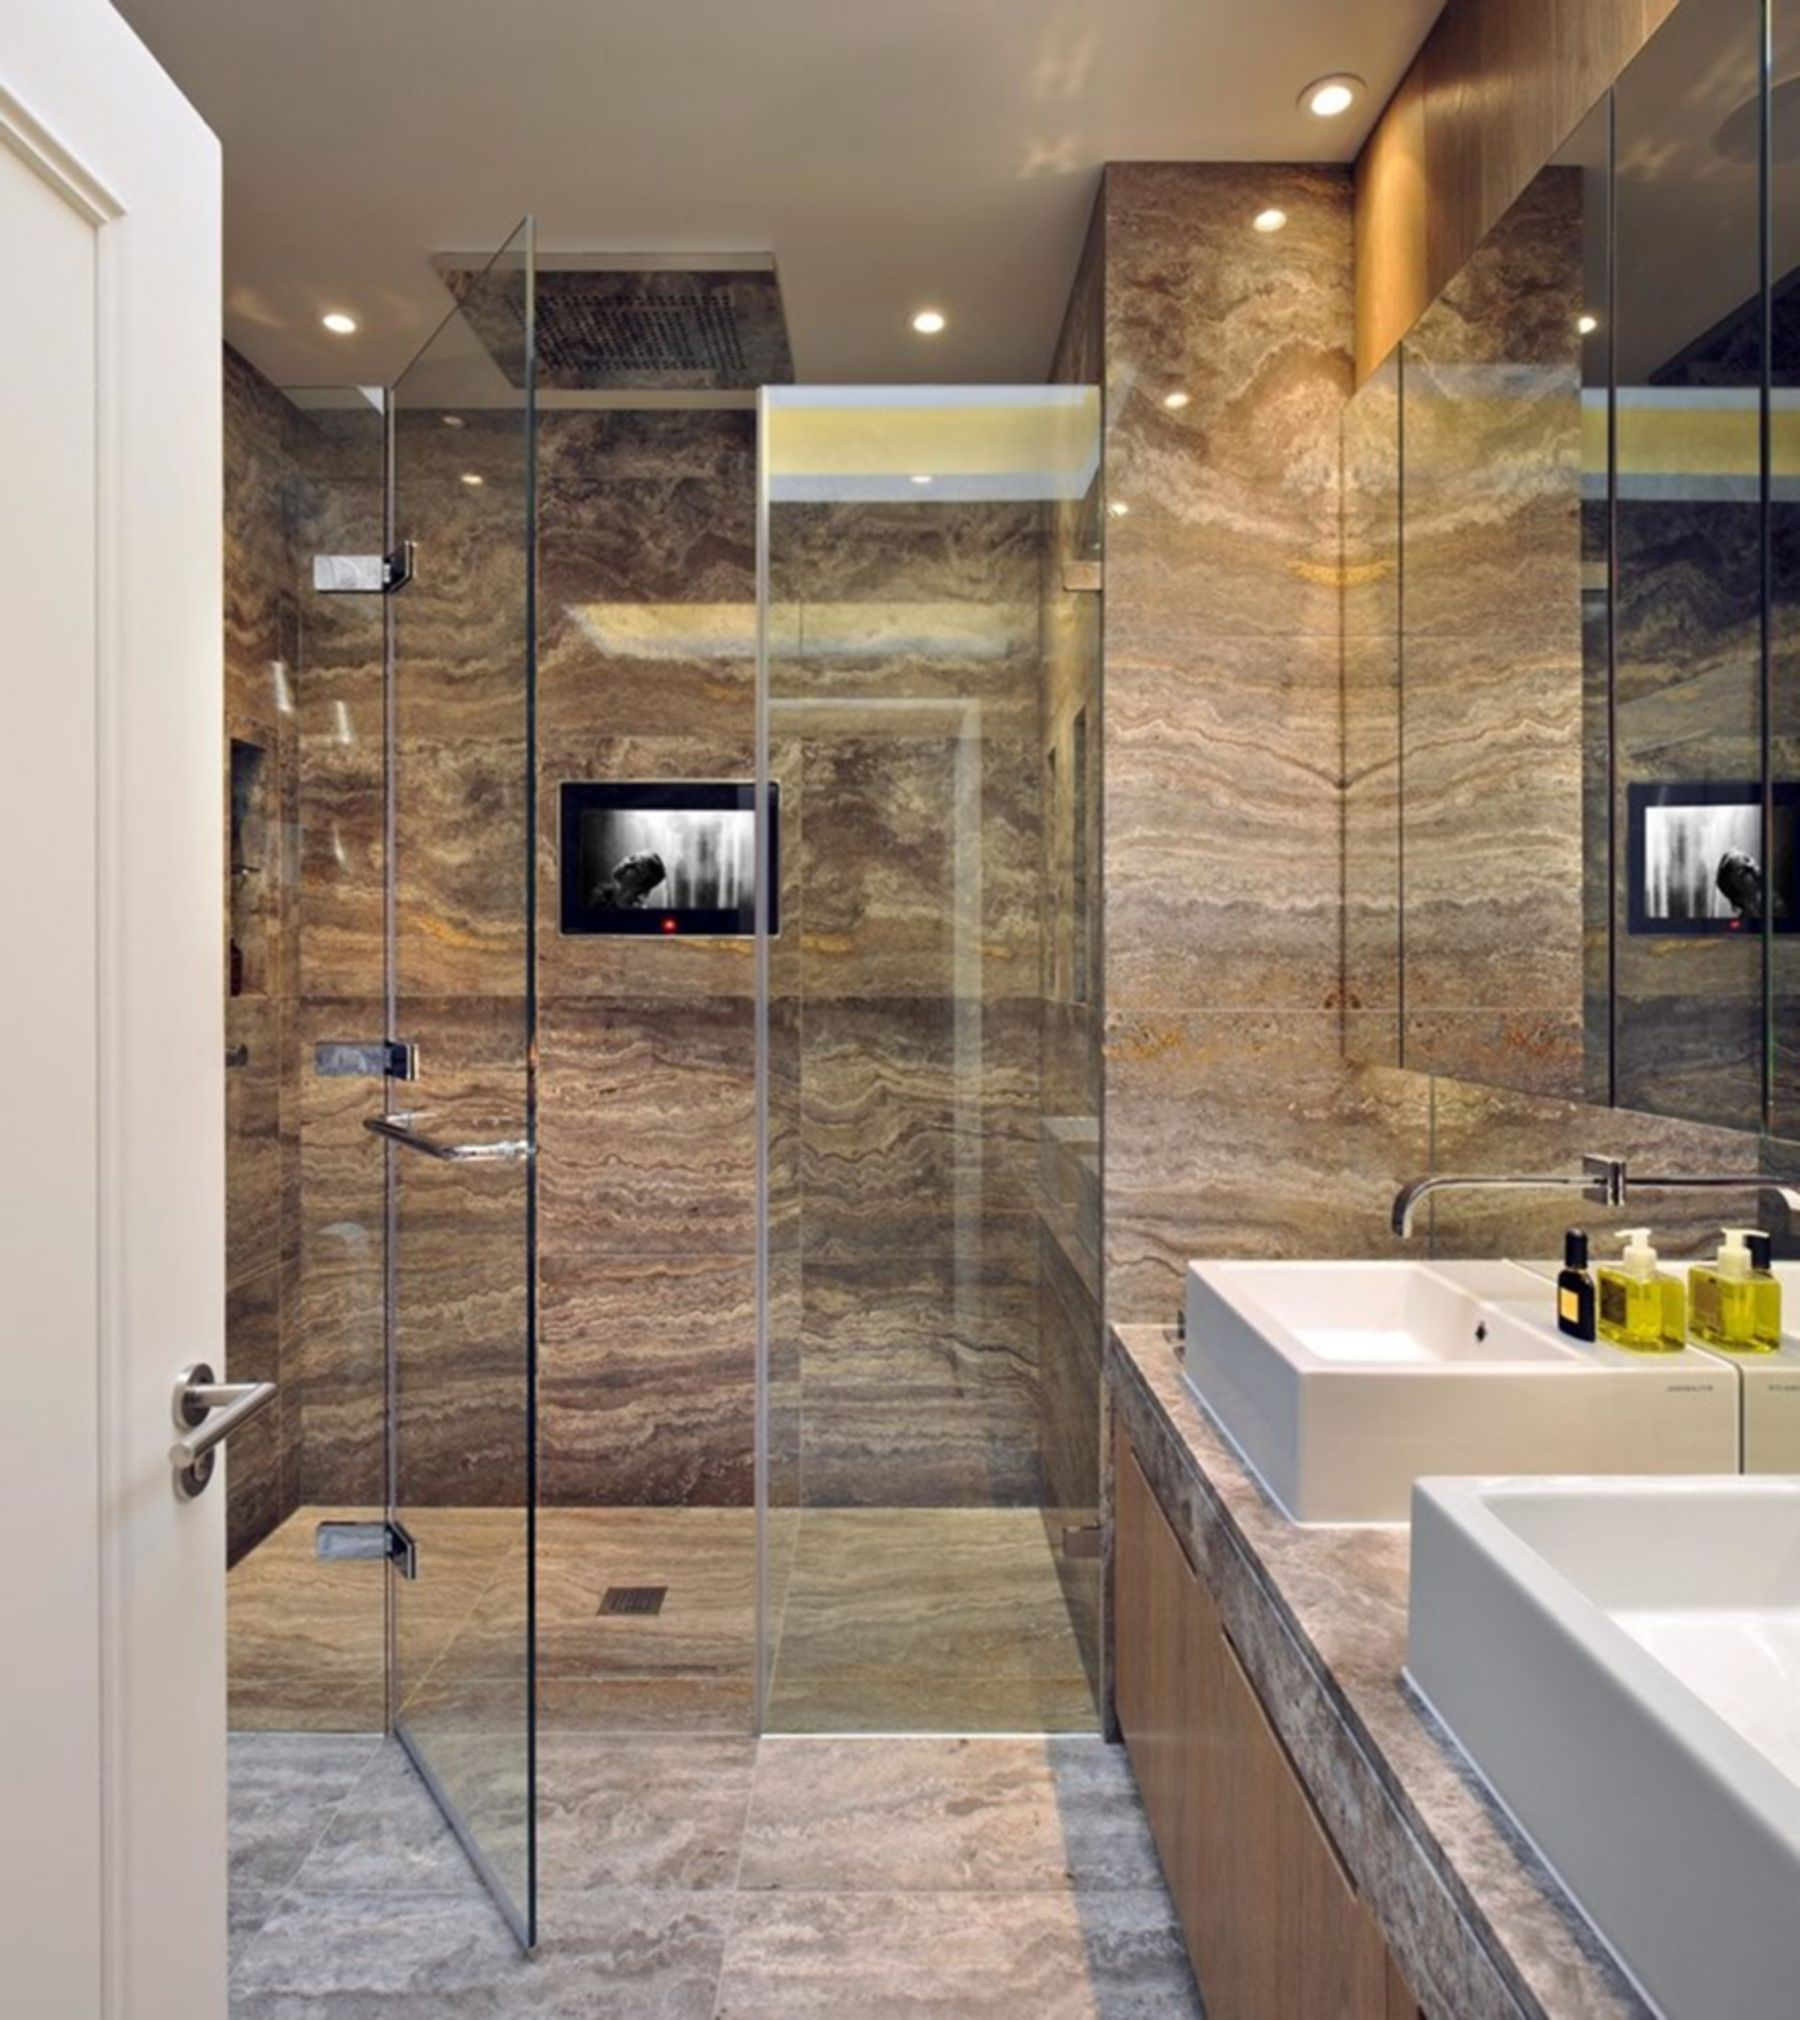 20 Incredible Modern Bathroom Design Ideas For More Enjoy Your Bath White Marble Bathrooms Bathroom Design Small Modern Modern Bathroom Design